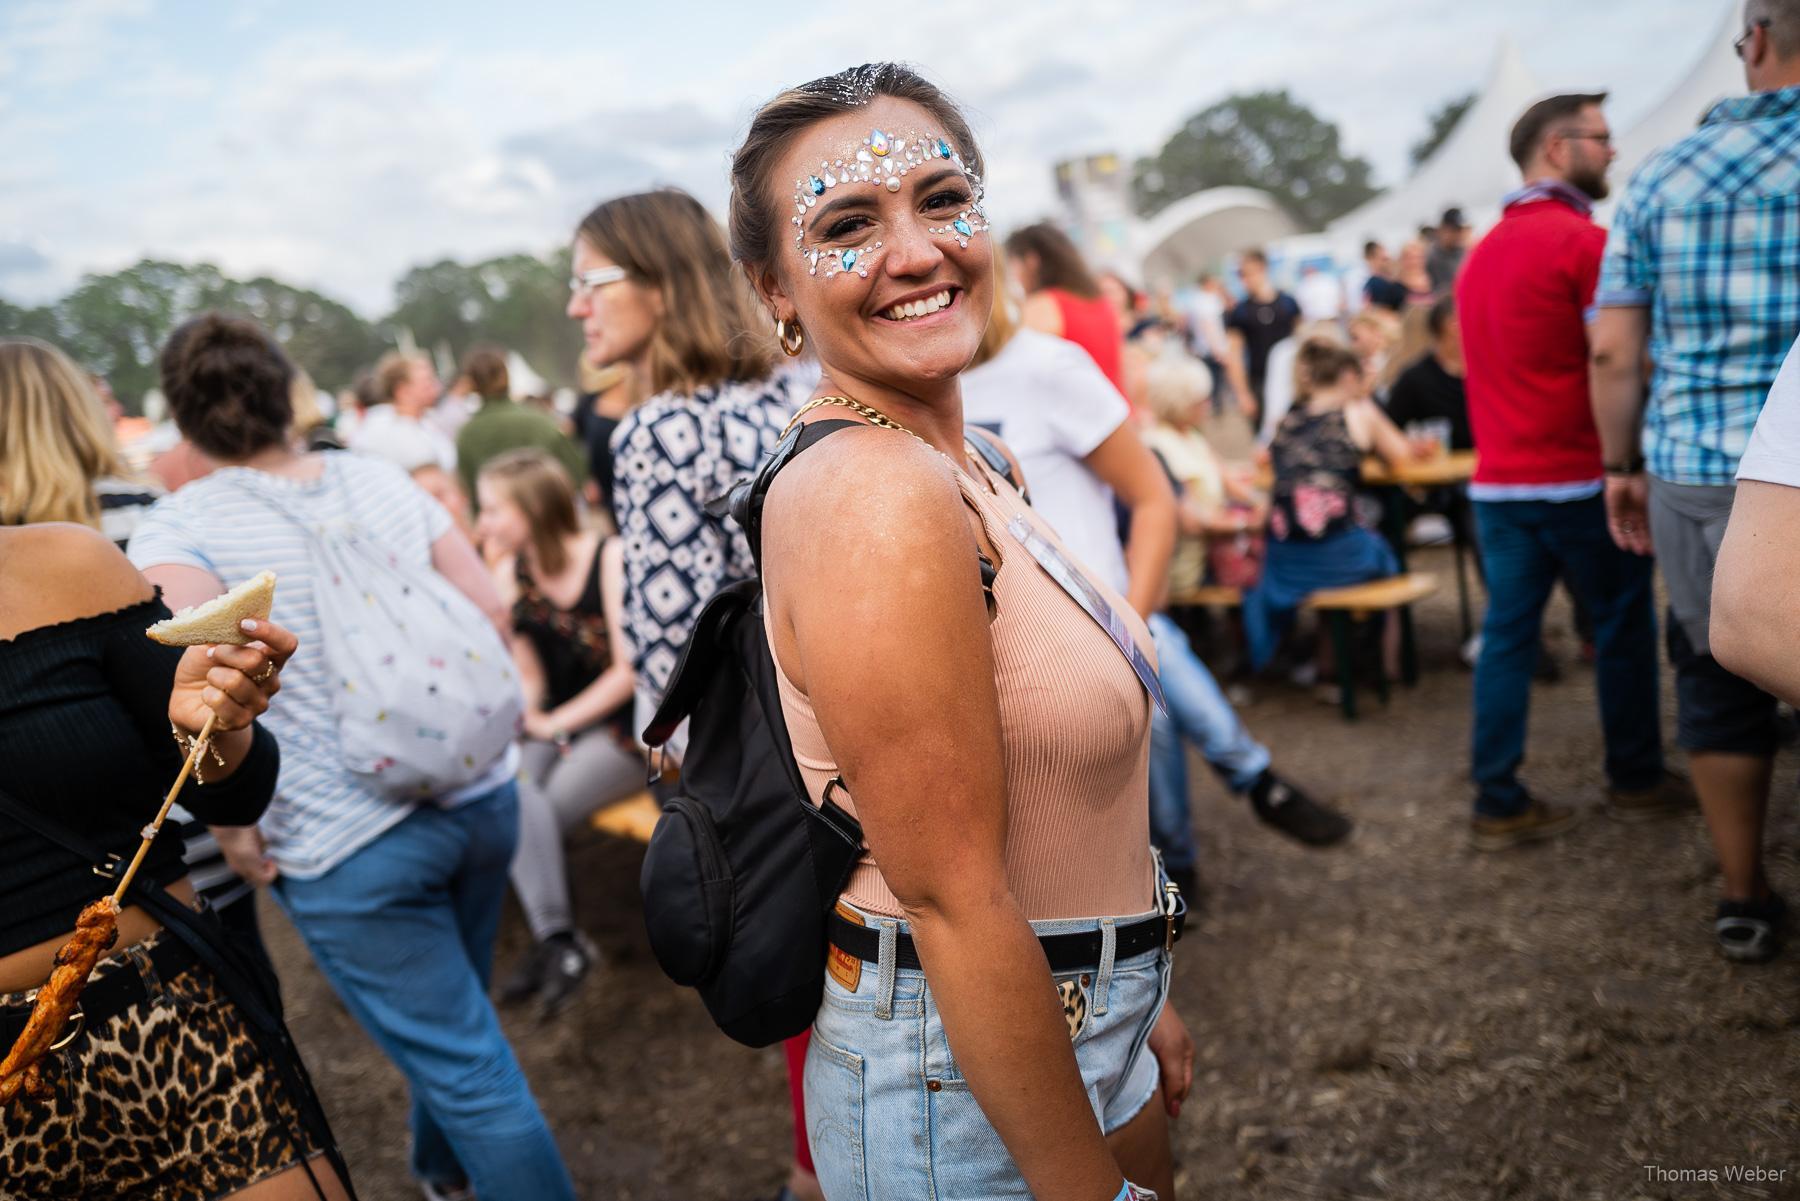 Das erste TabulaRaaza Festival bei Oldenburg, Fotograf Thomas Weber aus Oldenburg